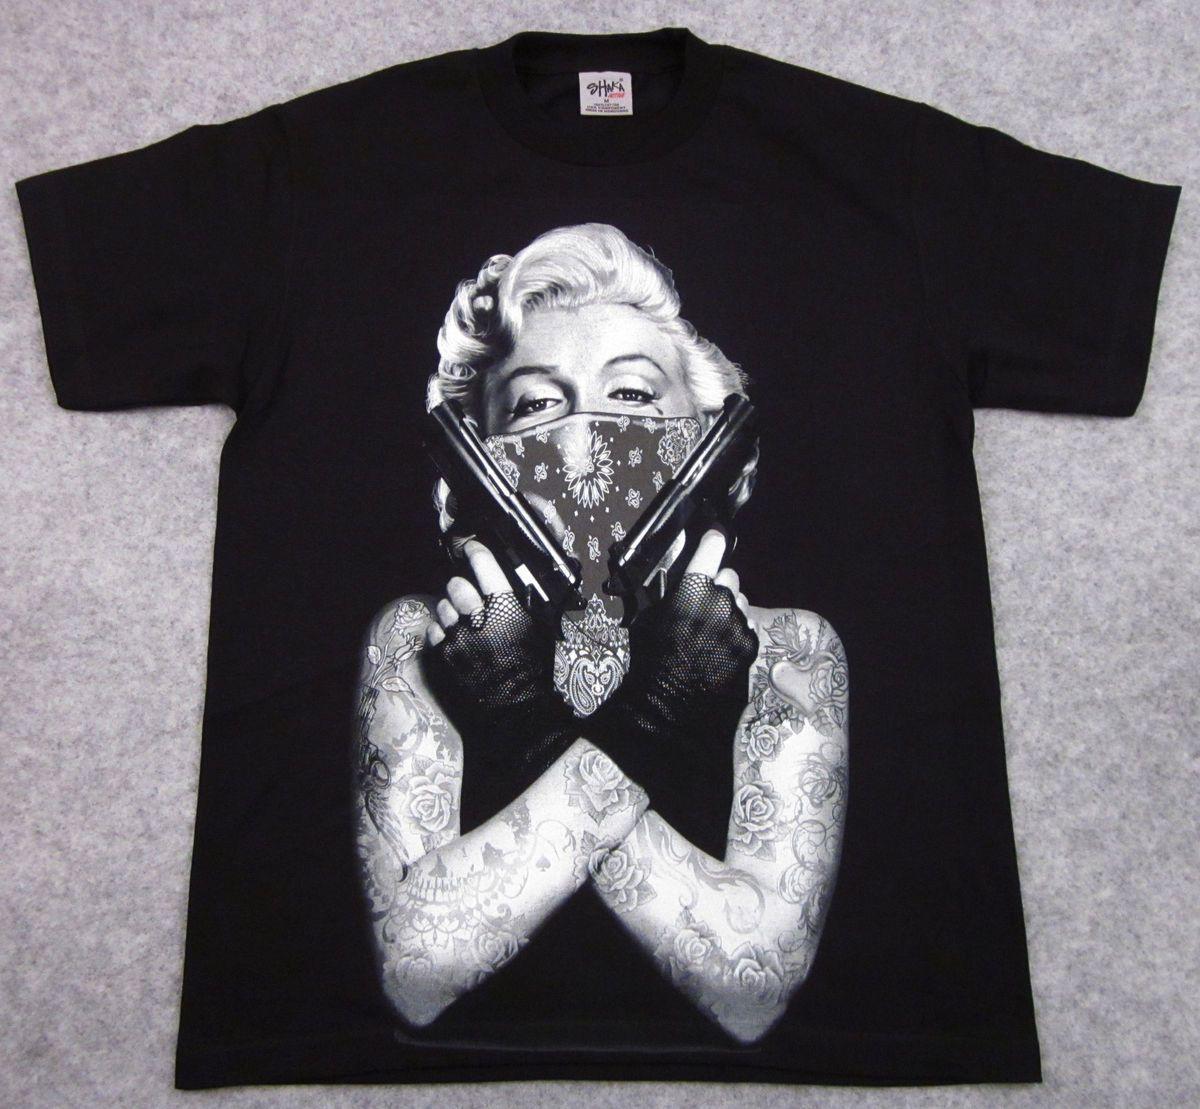 Marilyn Monroe T Shirt Tattoo Bandit Tee Guns Bandana Adult M L XL 2XL